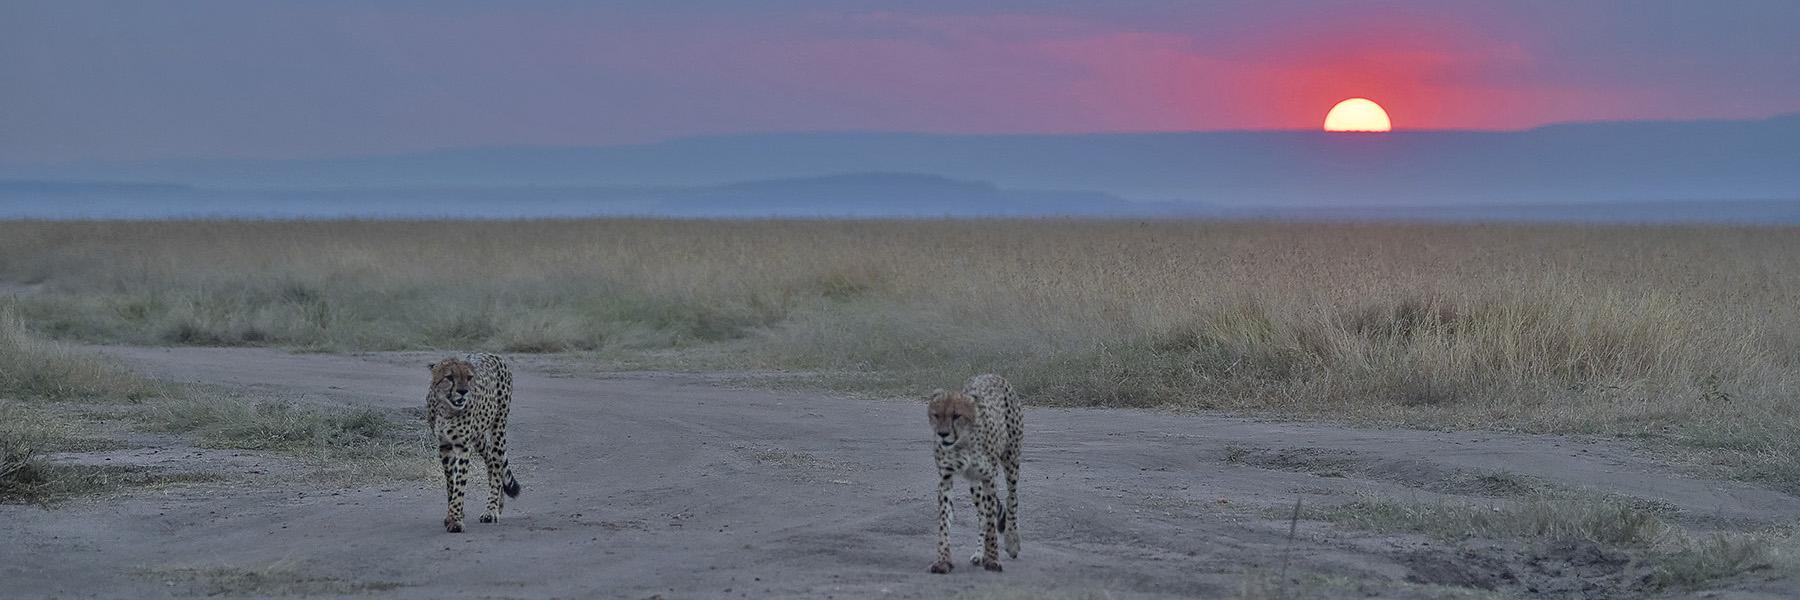 Highlights of Kenya